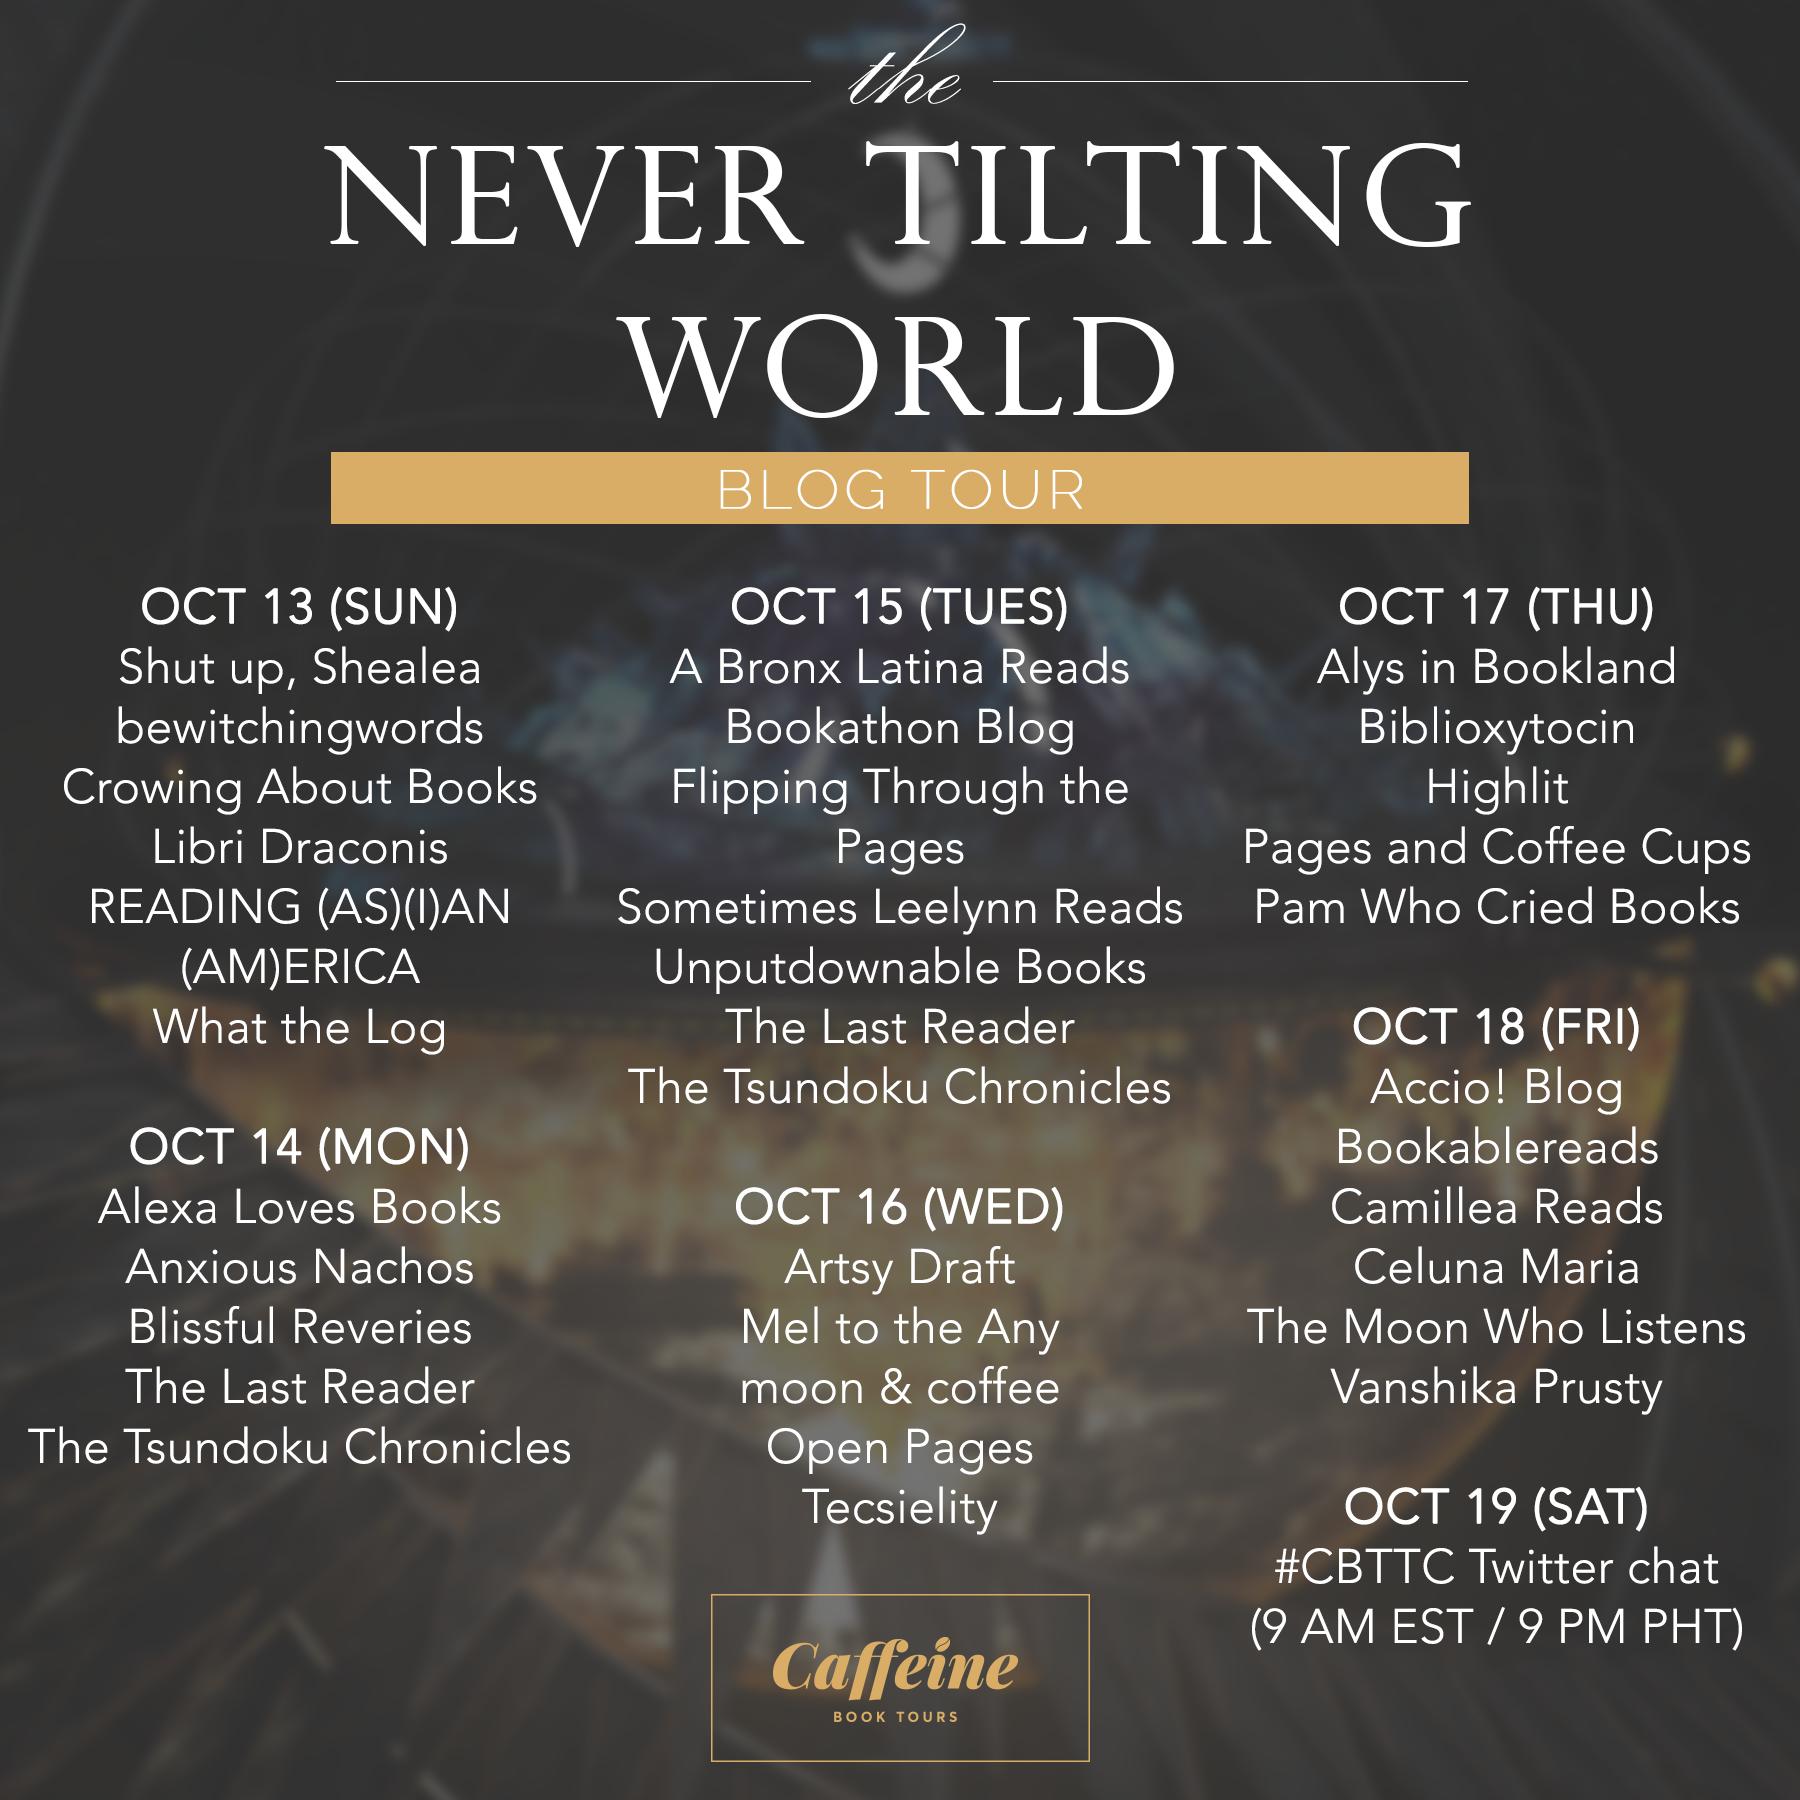 Tour Schedule (The Never Tilting World)